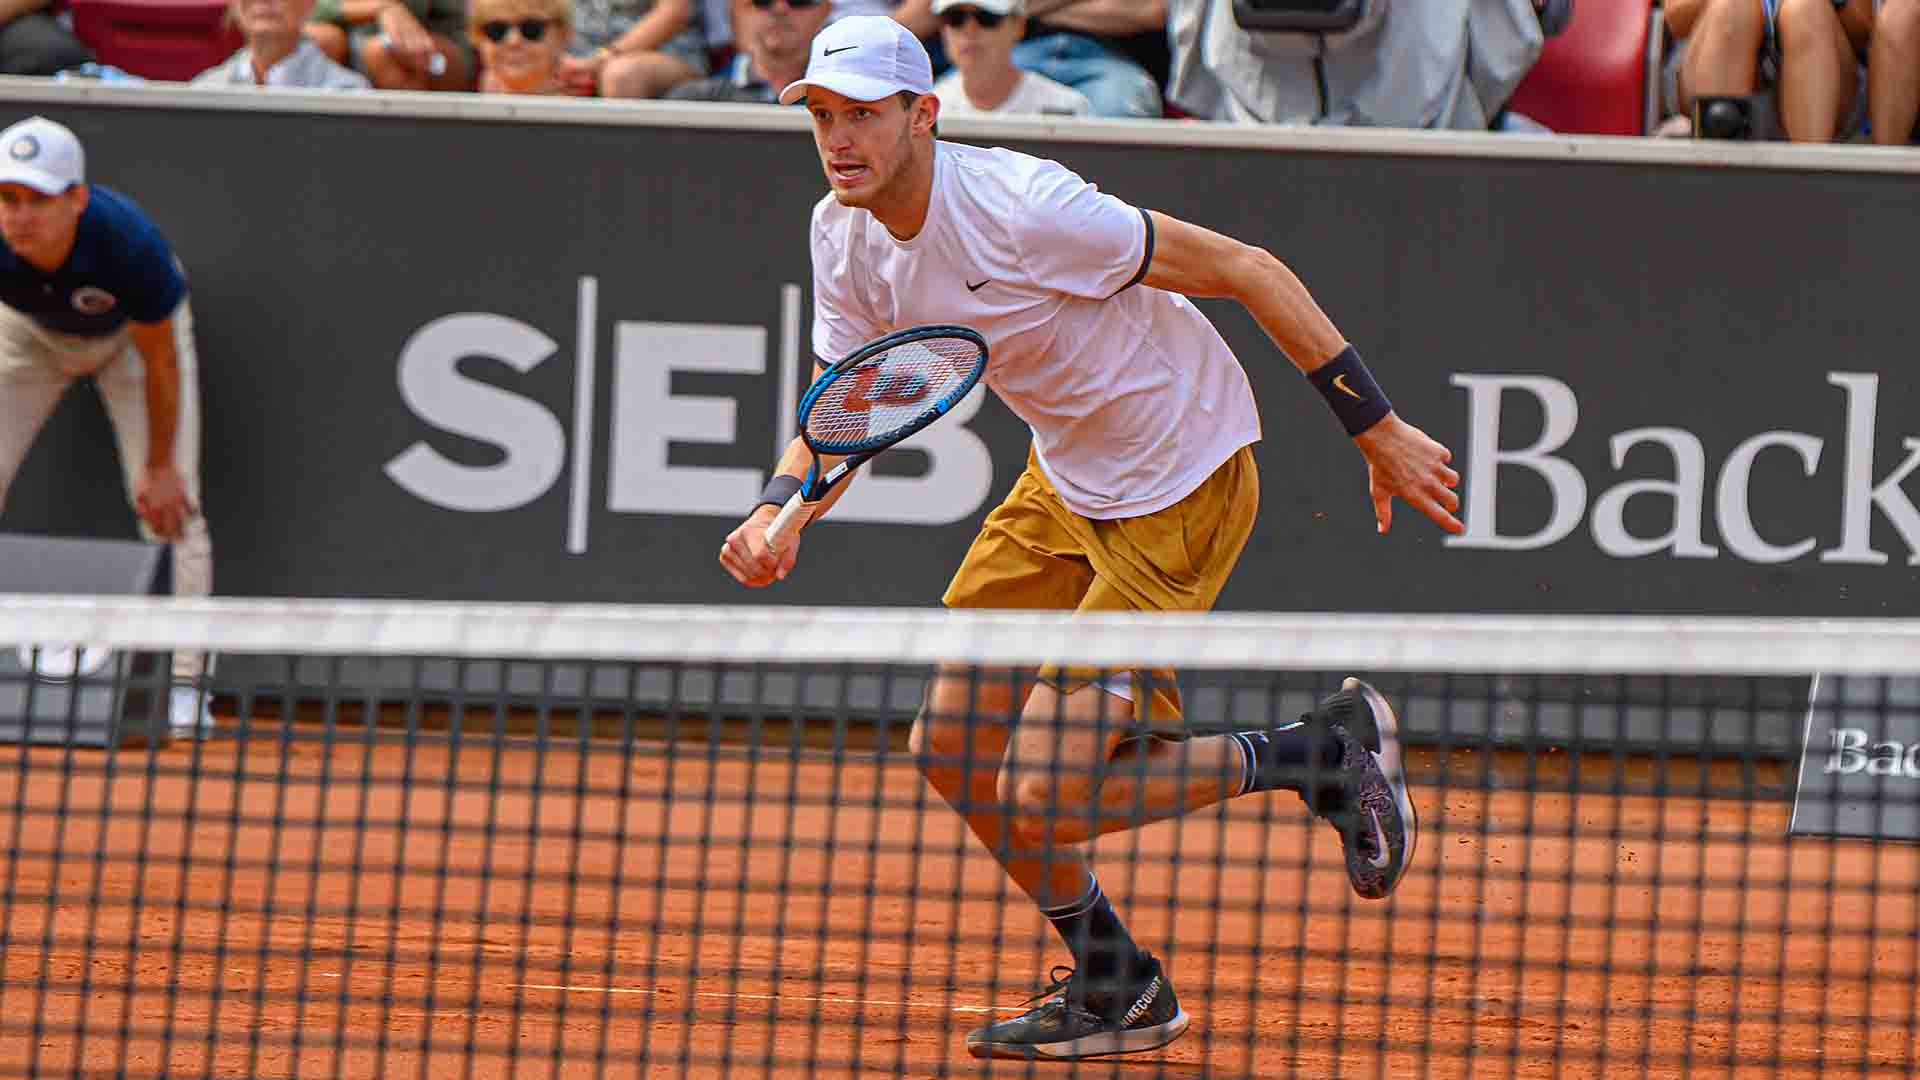 <a href='https://www.atptour.com/en/players/nicolas-jarry/j551/overview'>Nicolas Jarry</a> converts two of two break points to beat <a href='https://www.atptour.com/en/players/juan-ignacio-londero/lb84/overview'>Juan Ignacio Londero</a> in the Swedish Open final on Sunday.